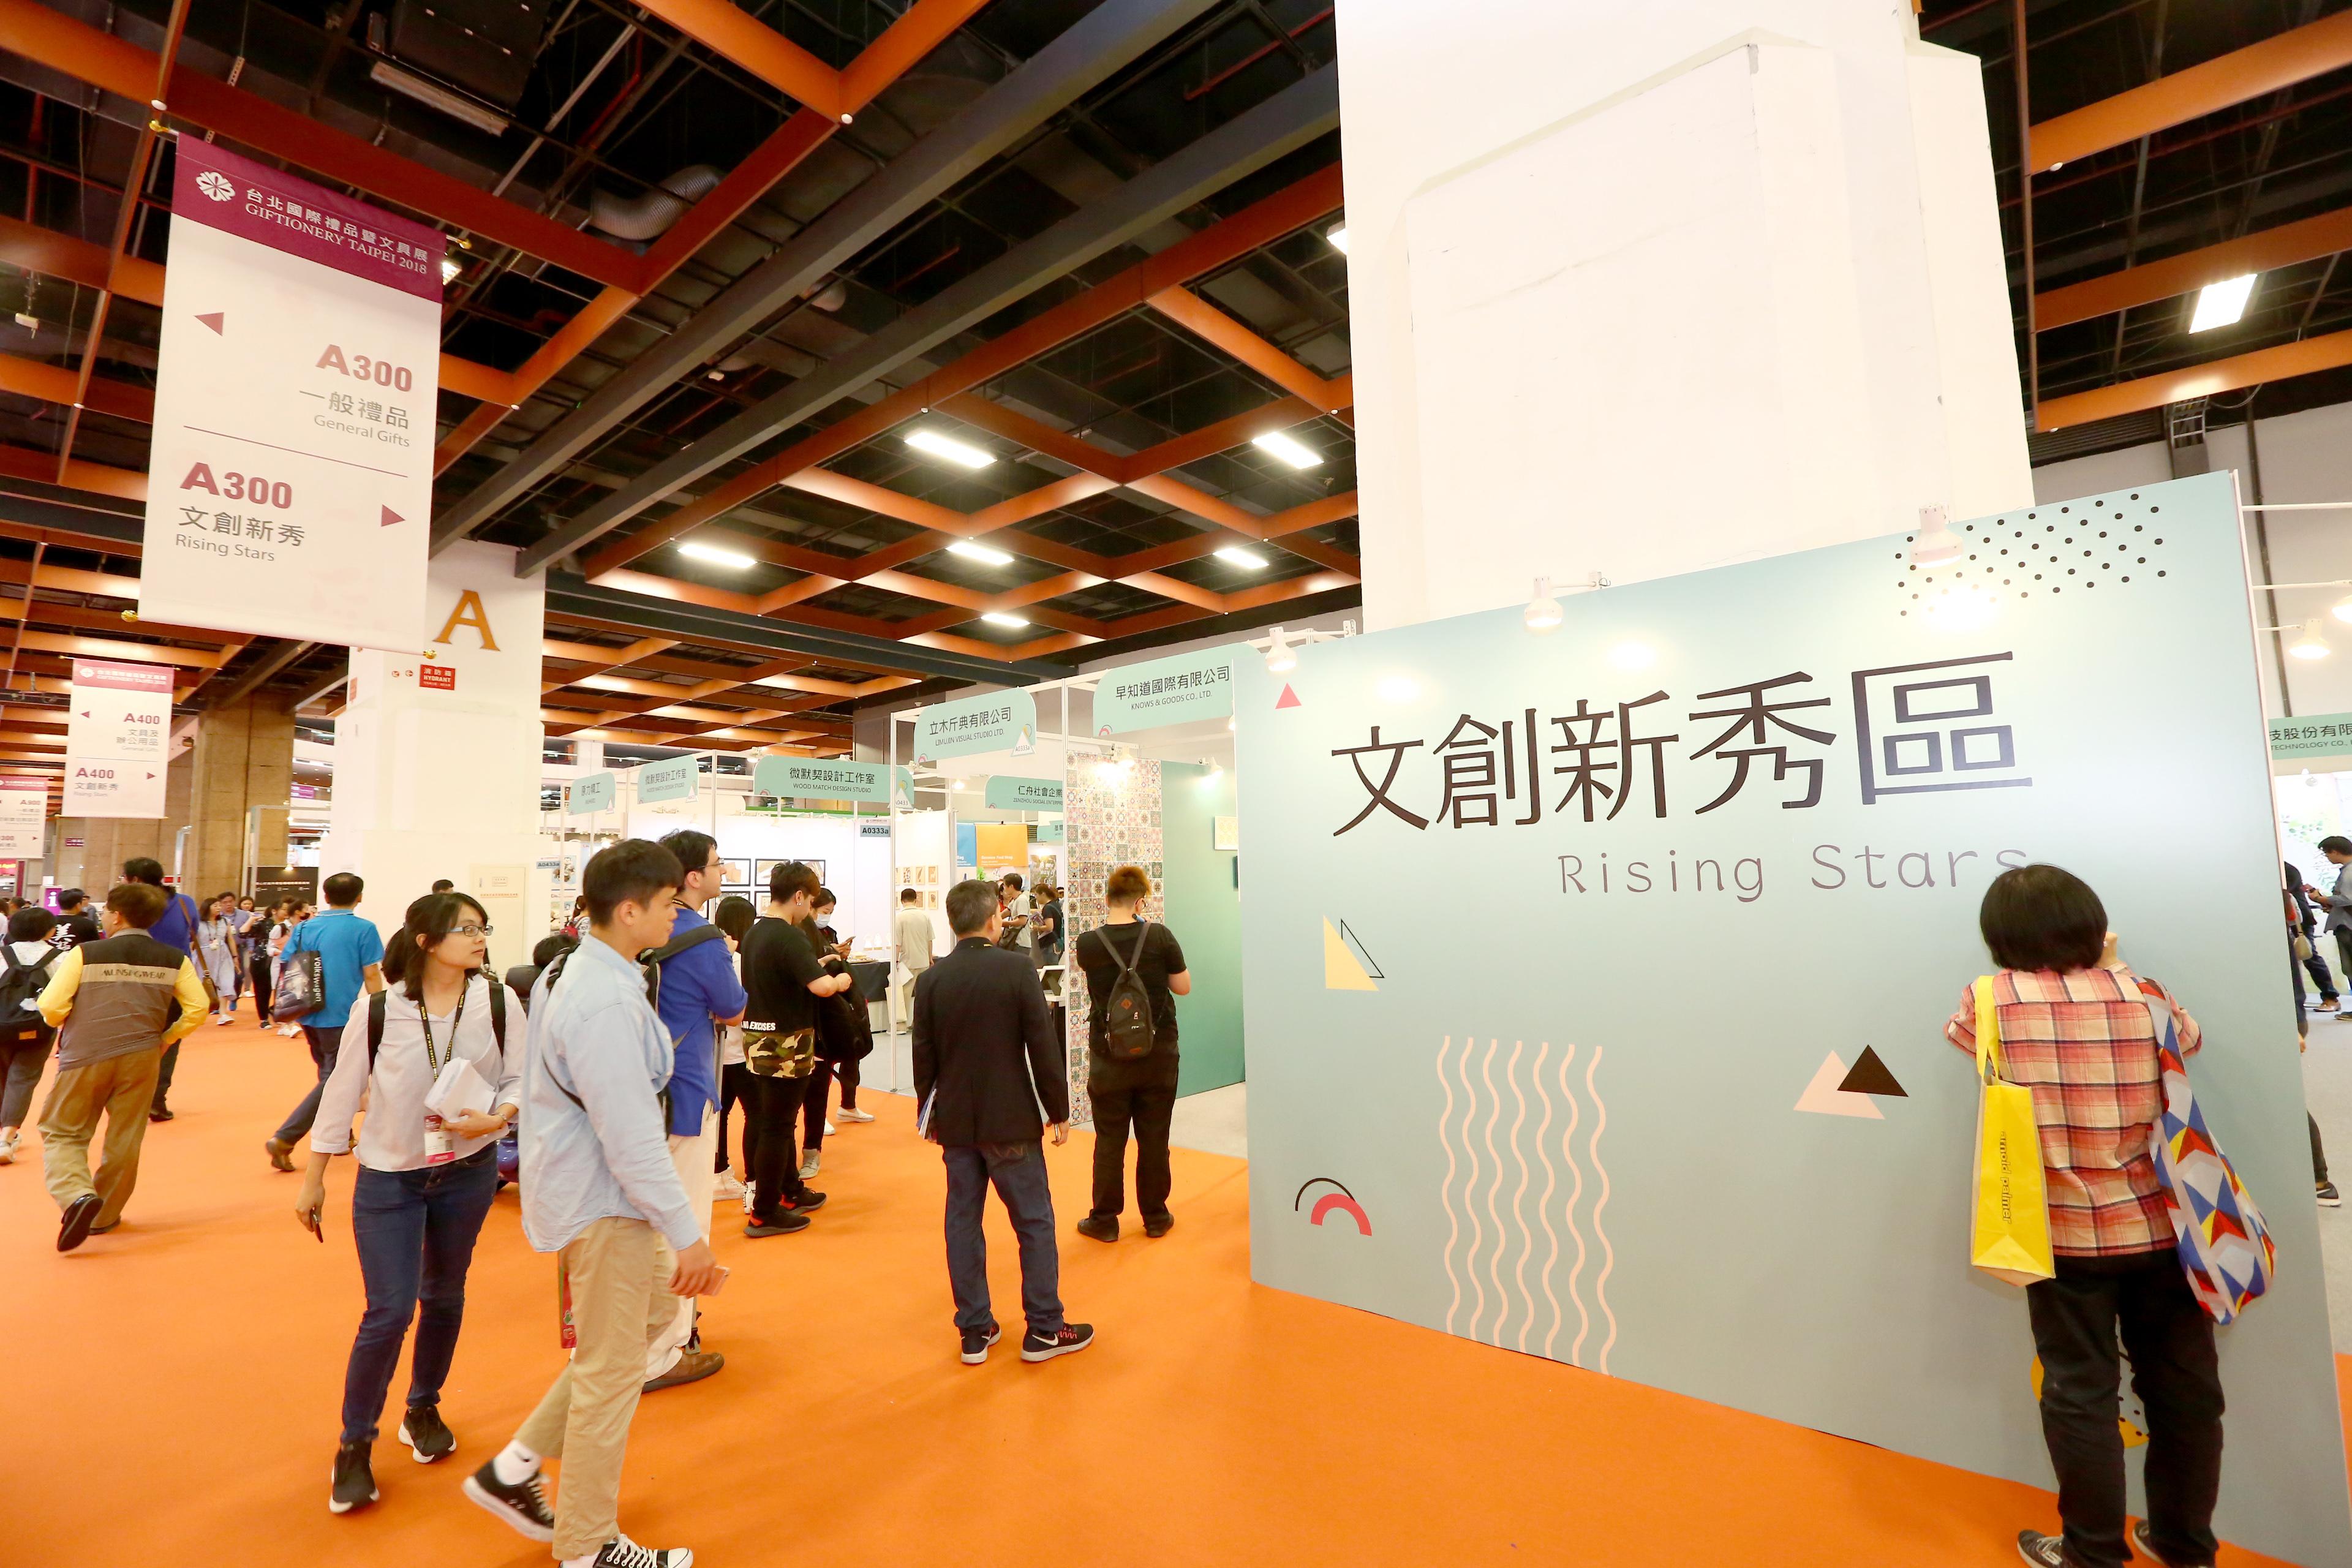 https://storage.googleapis.com/www.taiwantradeshow.com.tw/activity-photo/202011/T-65367462-name.jpg